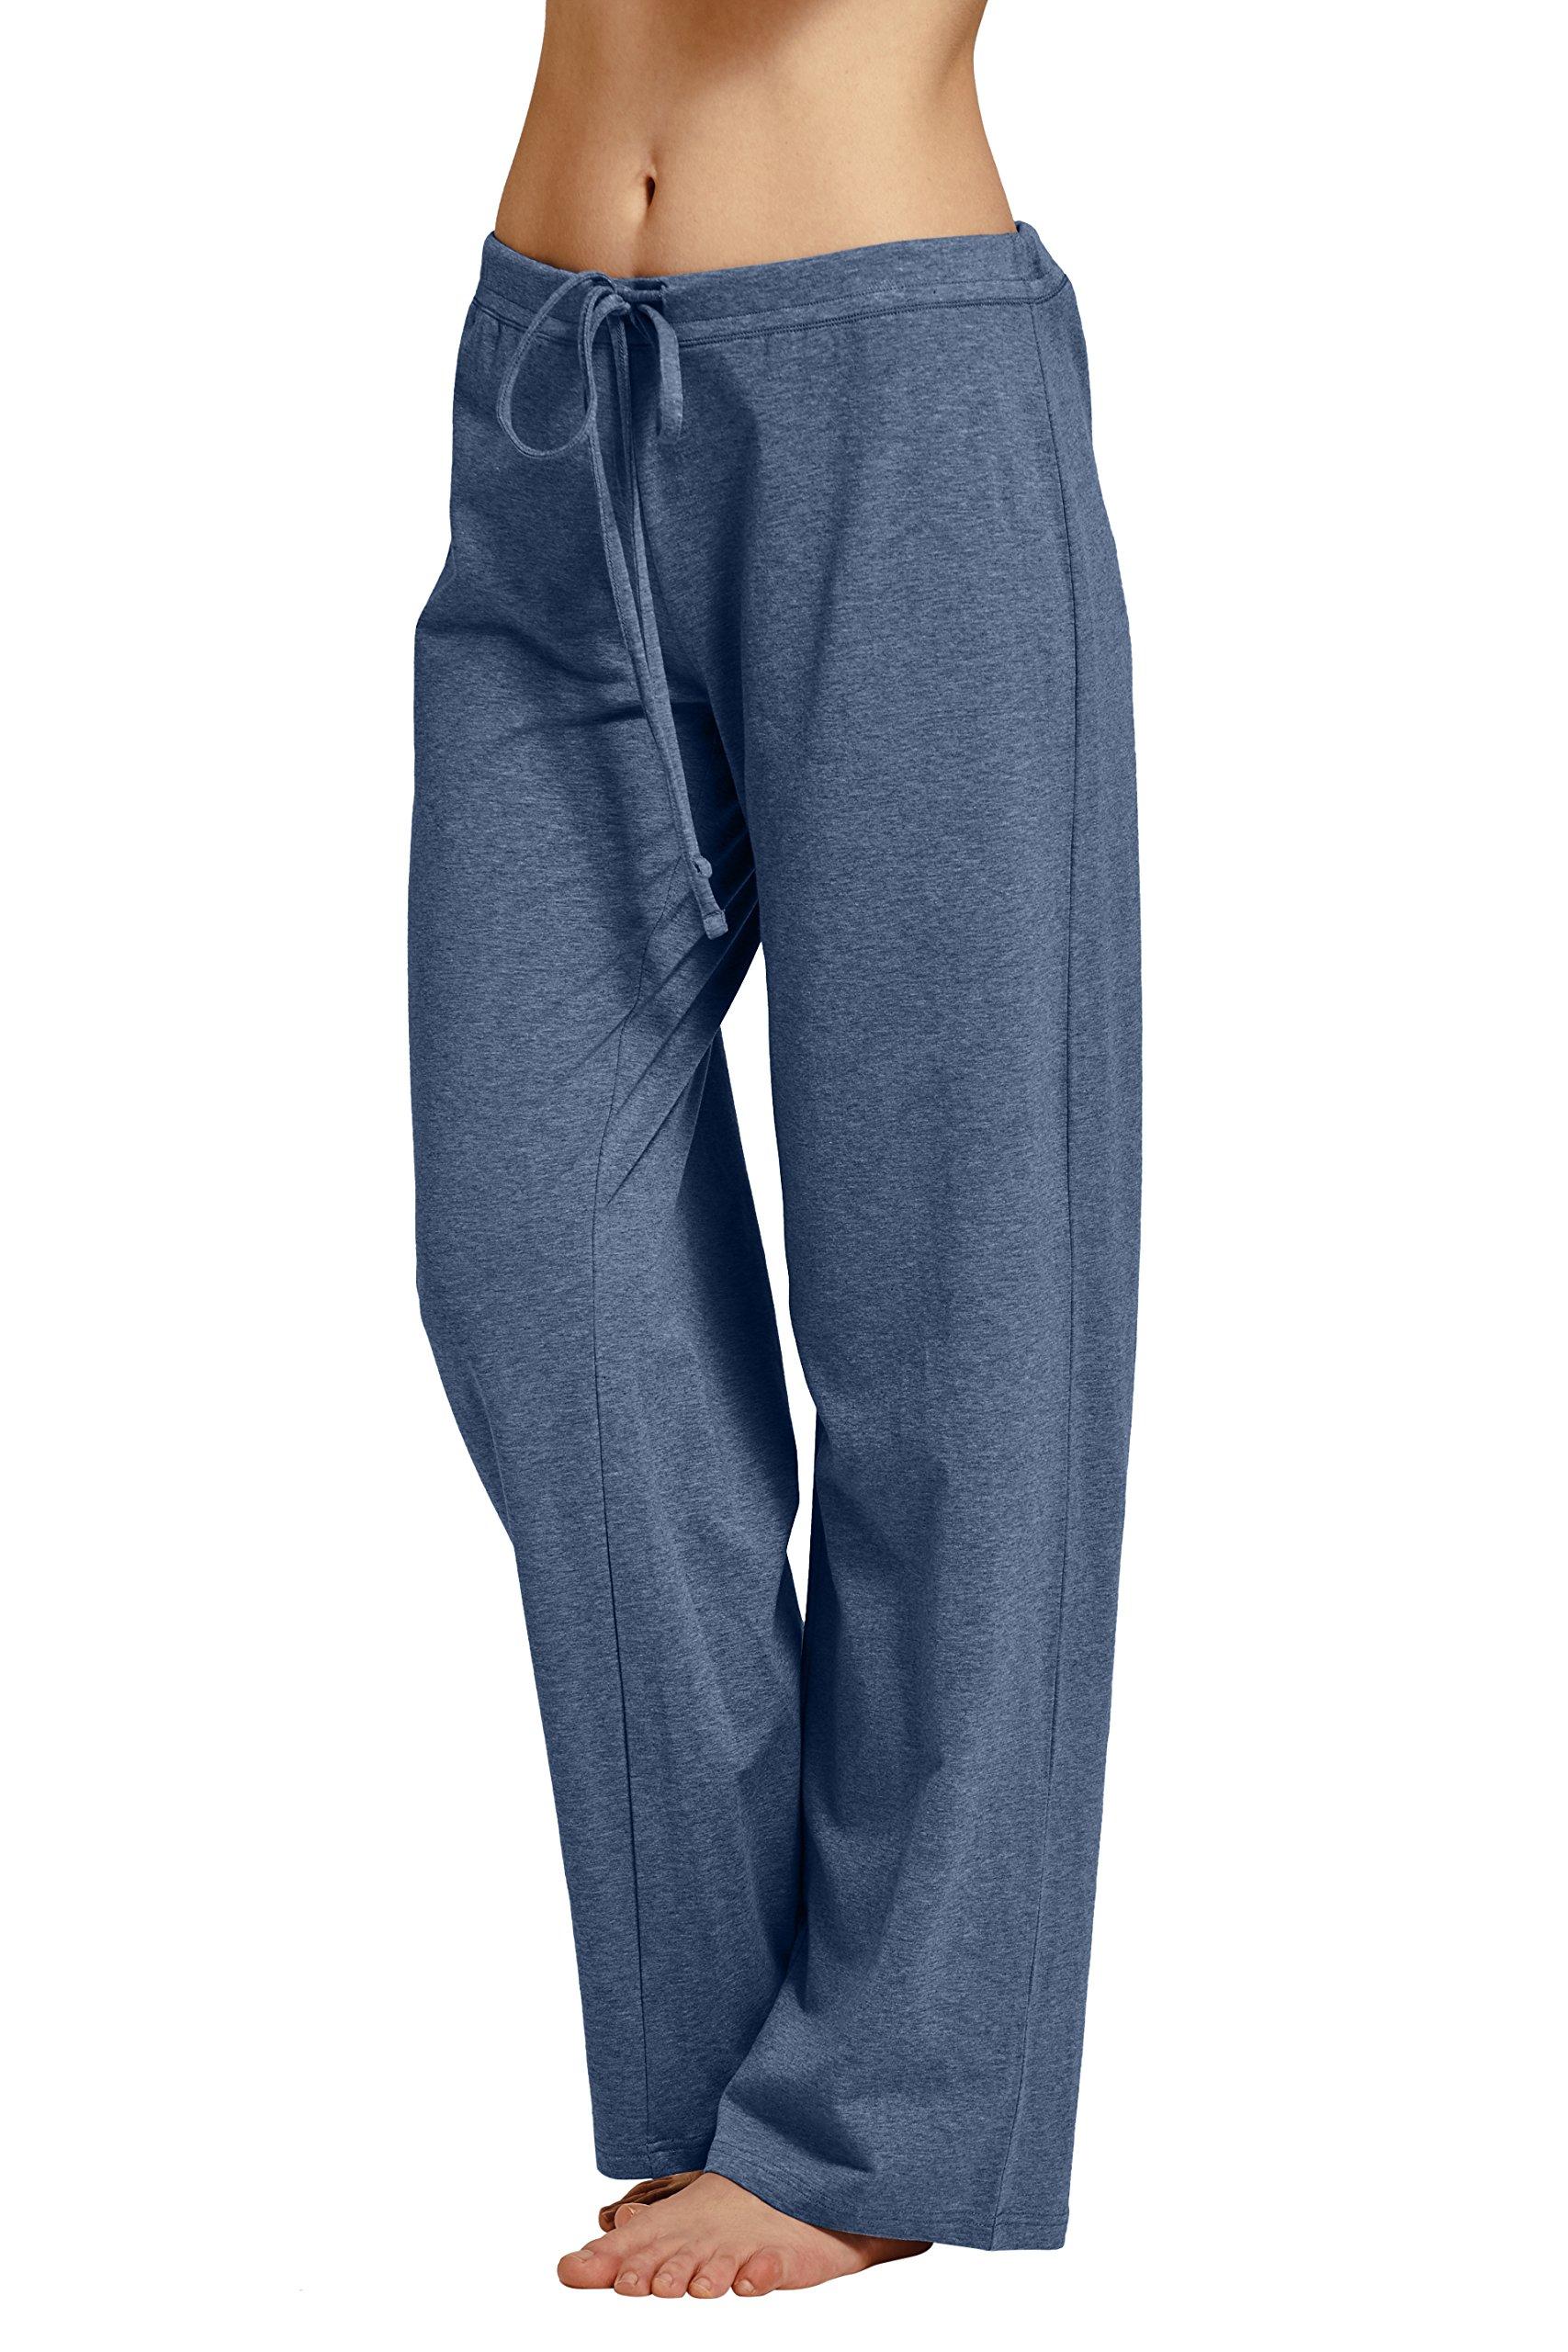 CYZ Women's Basic Stretch Cotton Knit Pajama Sleep Lounge Pan-DarkBlueMelange-L